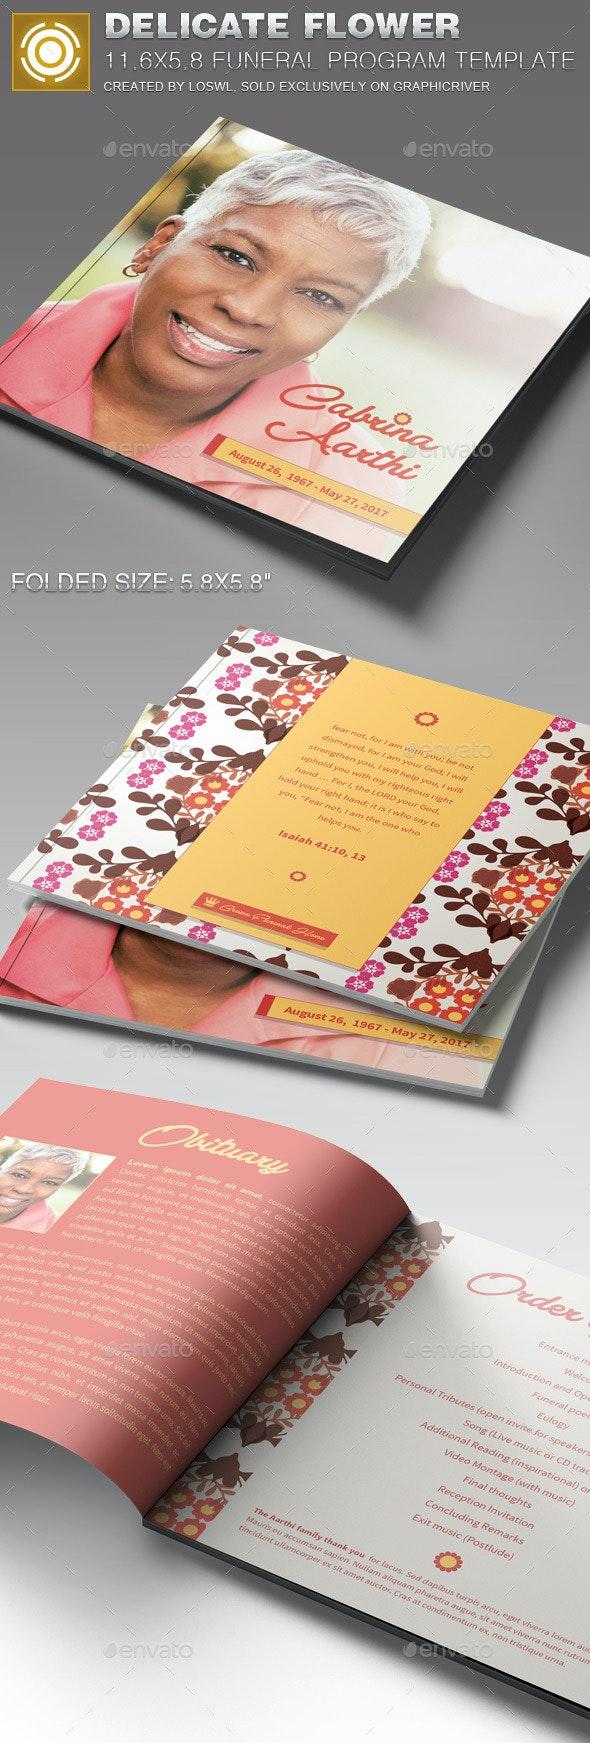 Delicate Flower Funeral Program Template - Informational Brochures